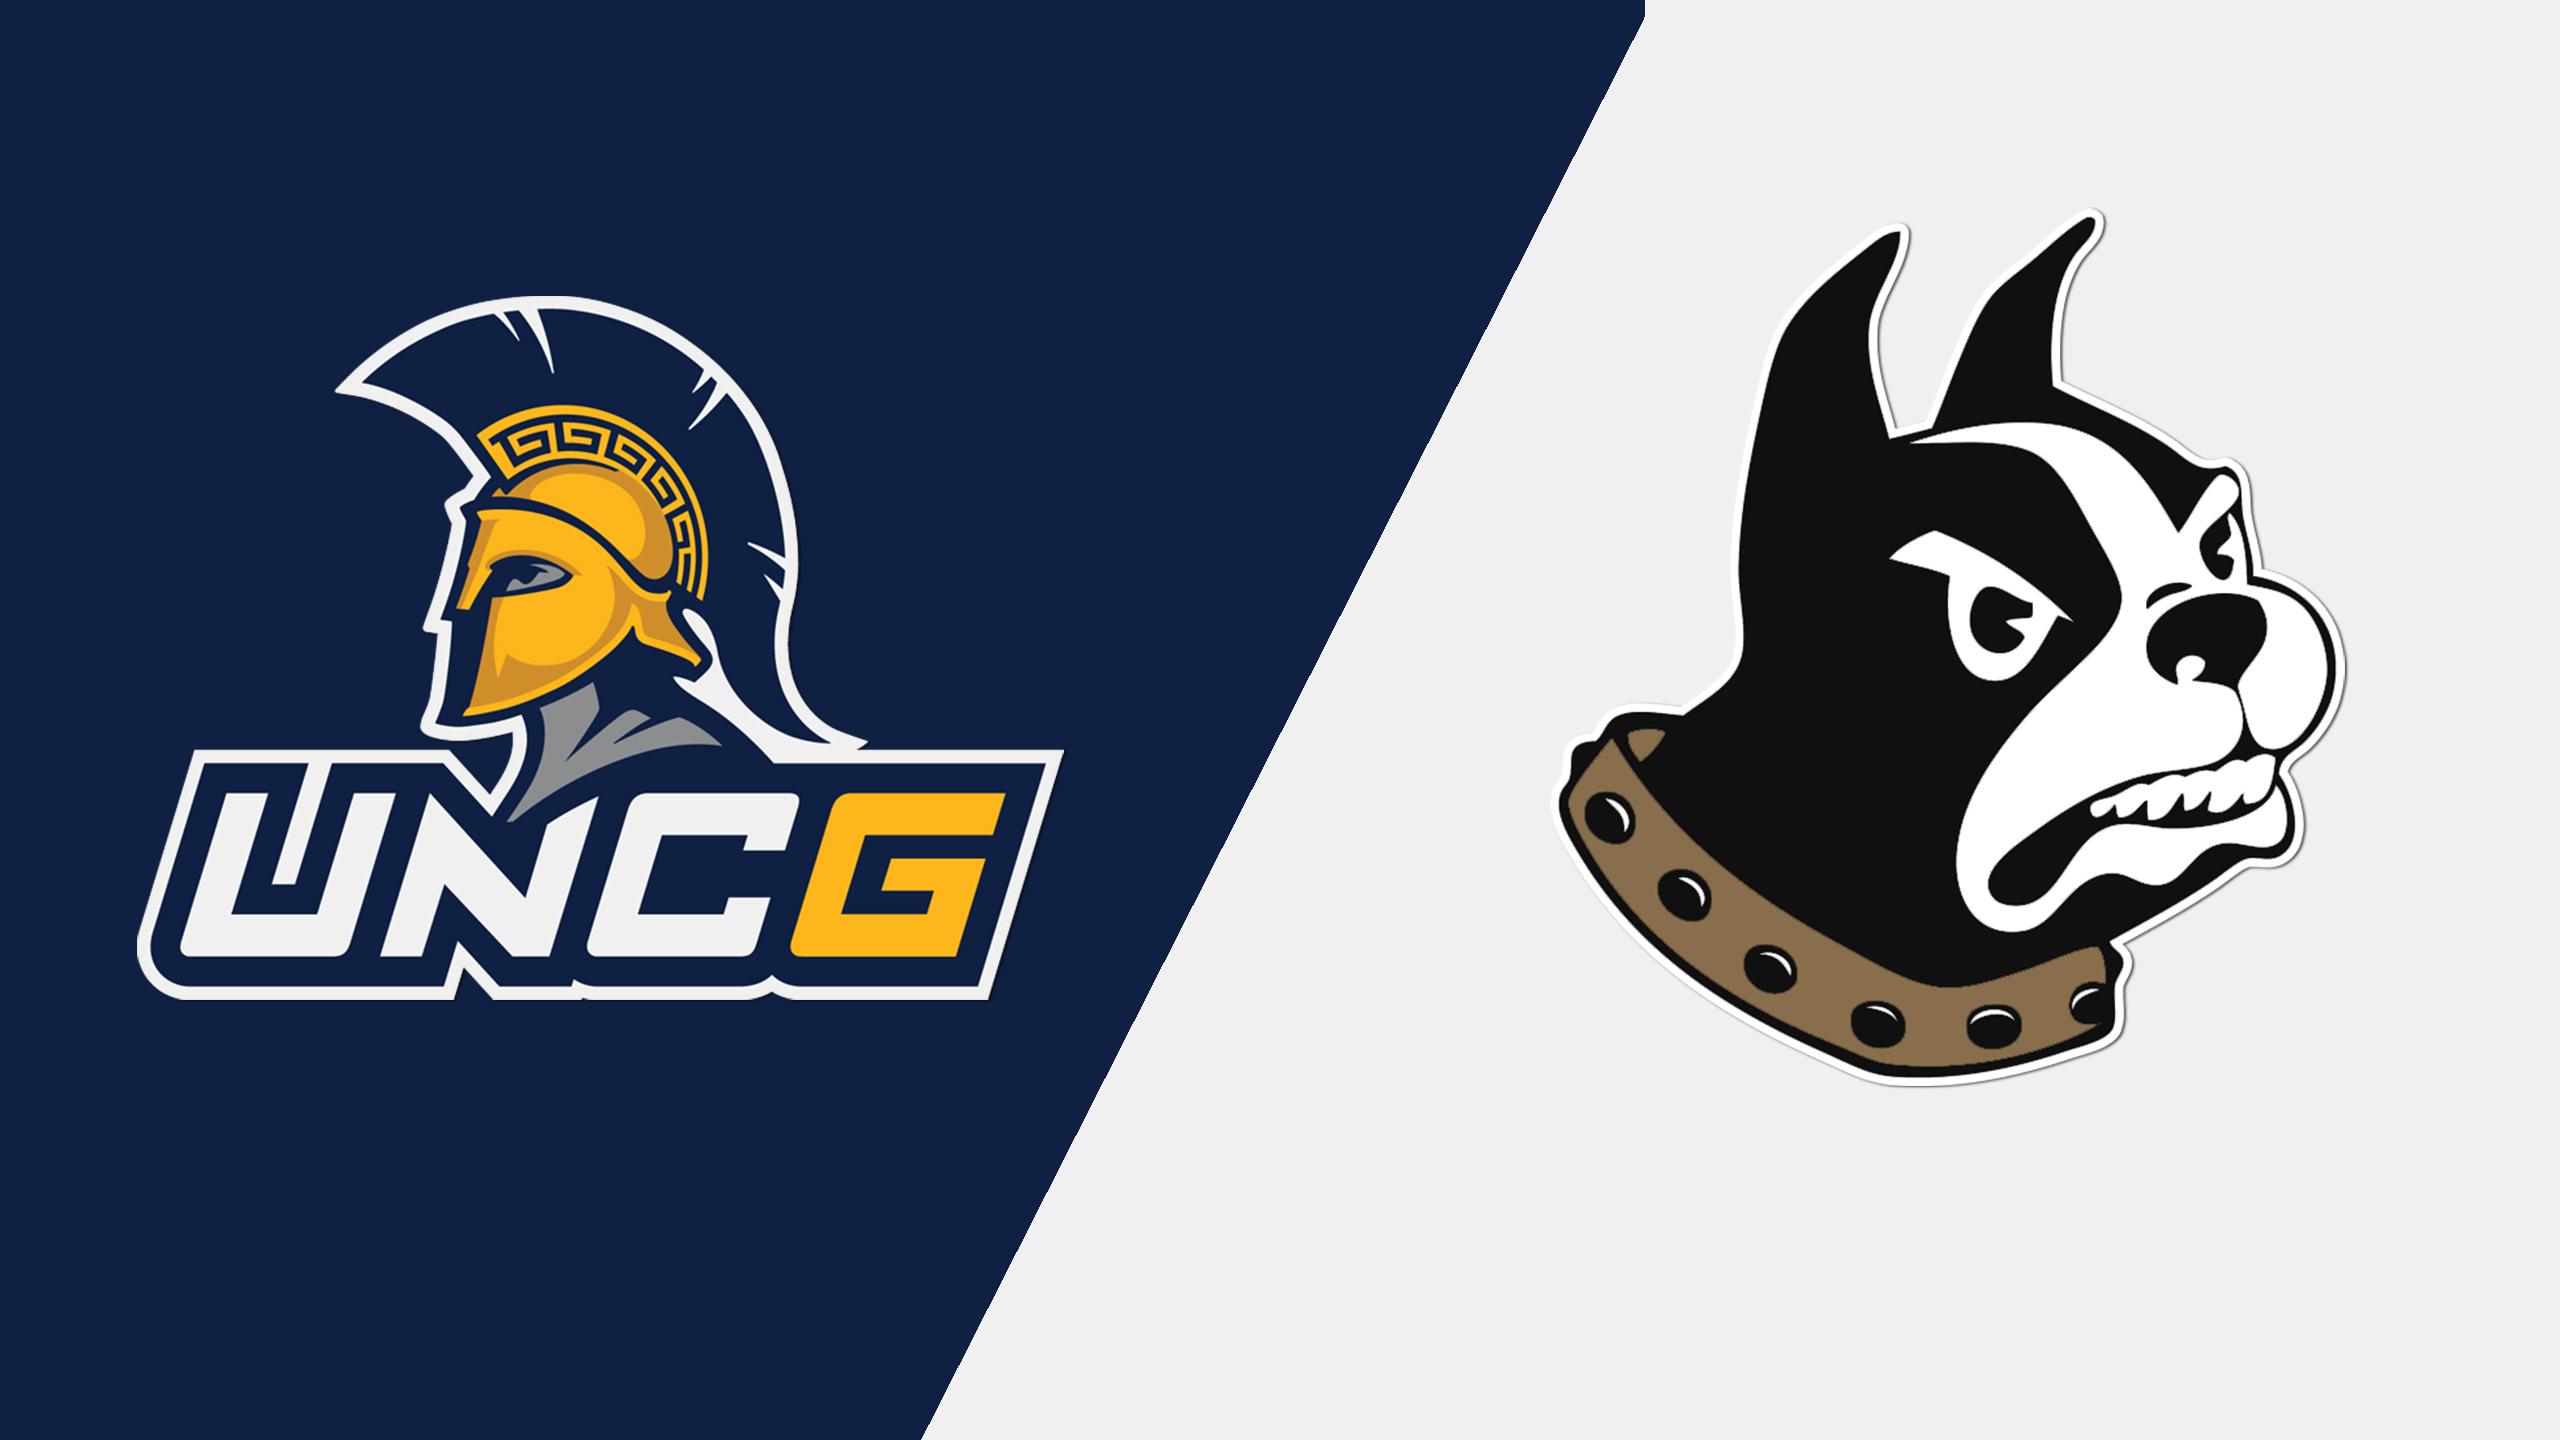 UNC Greensboro vs. Wofford (W Basketball)